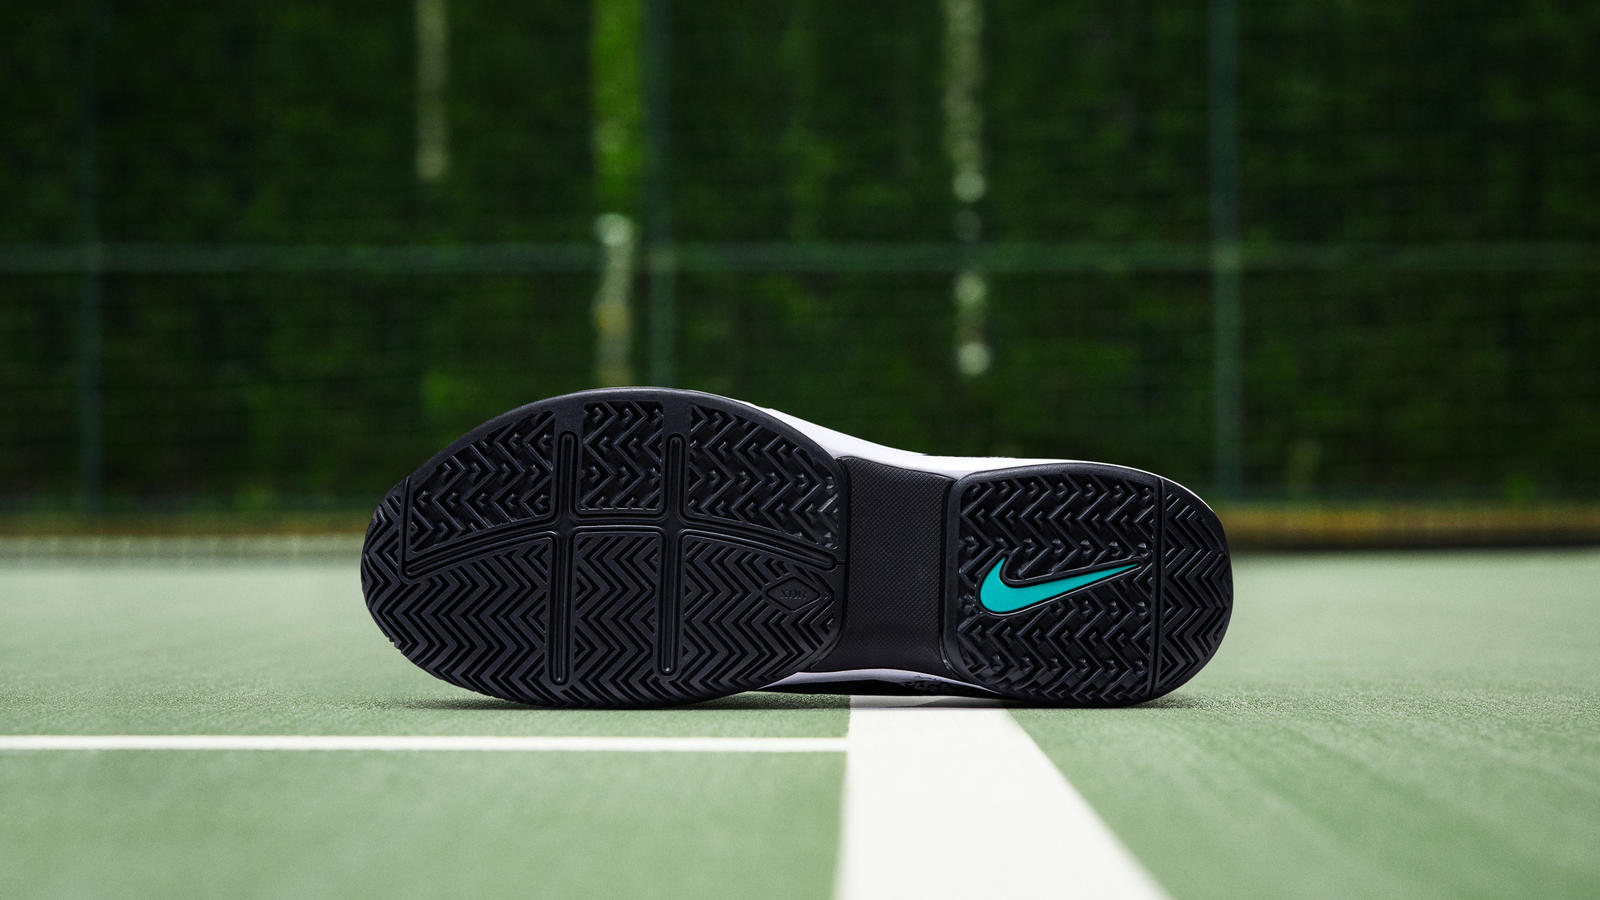 e323a9f5341 NikeCourt Zoom Vapor RF x AJ3